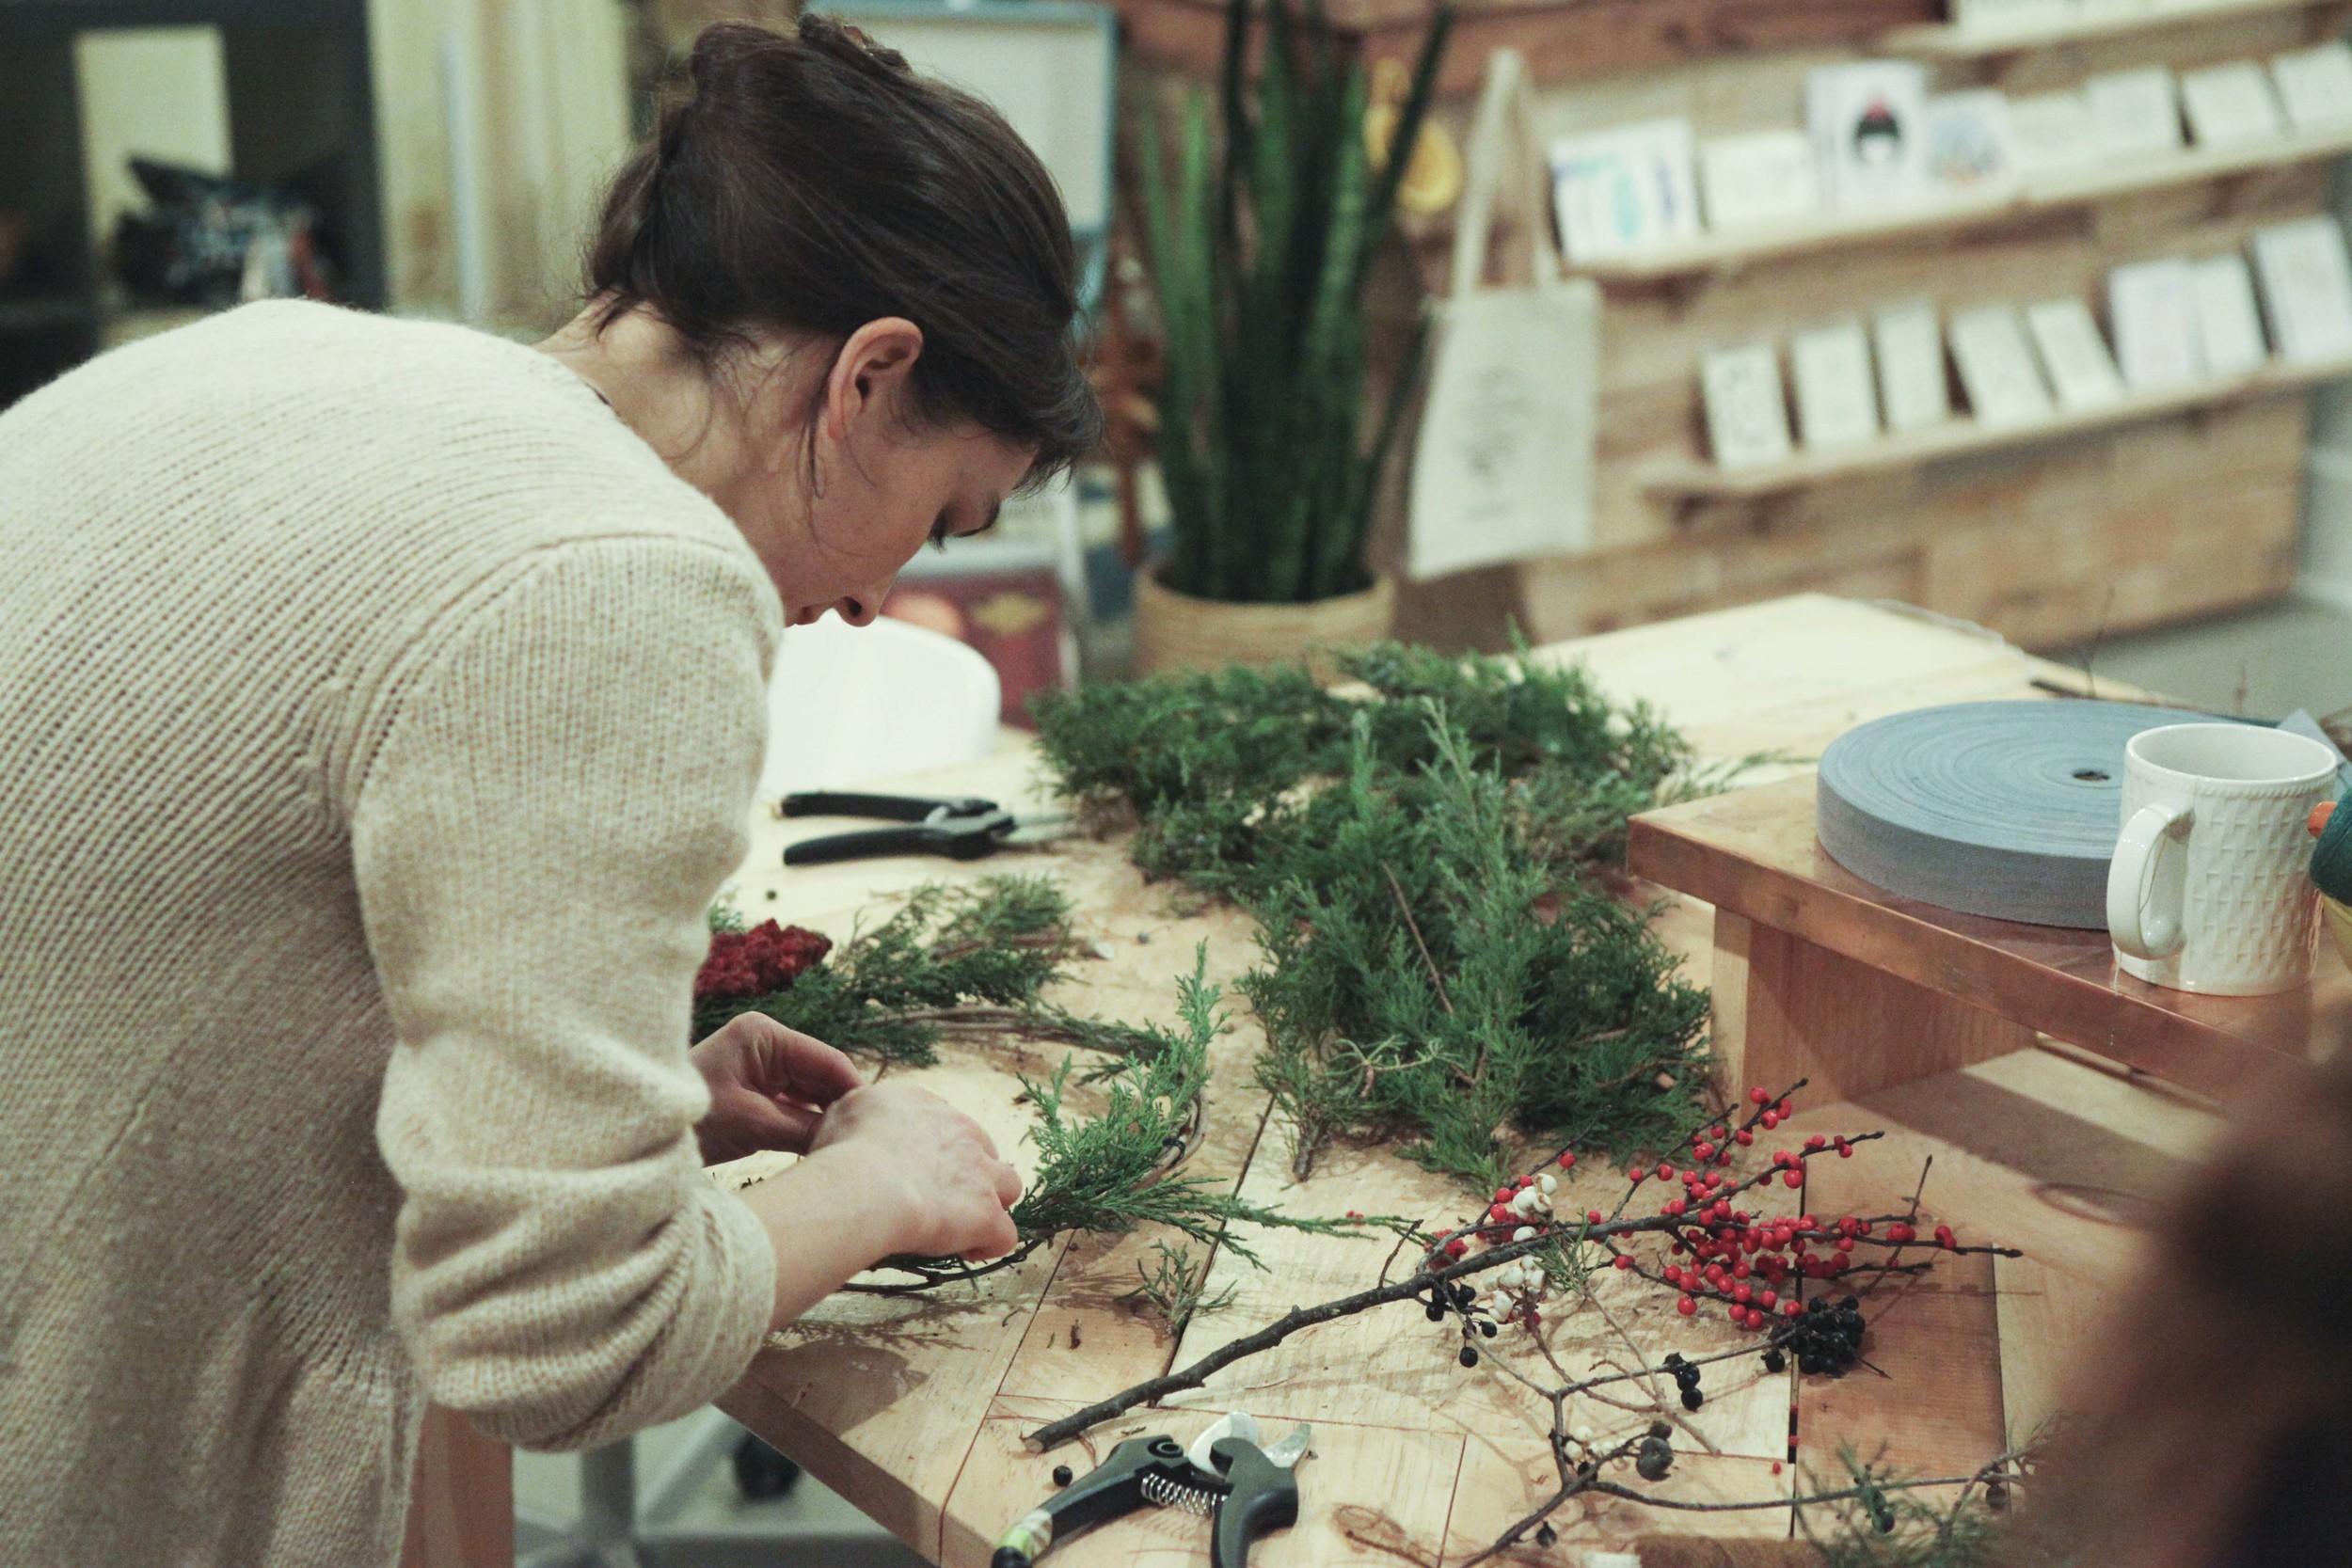 o-workshop-2014-wreath_11.jpg